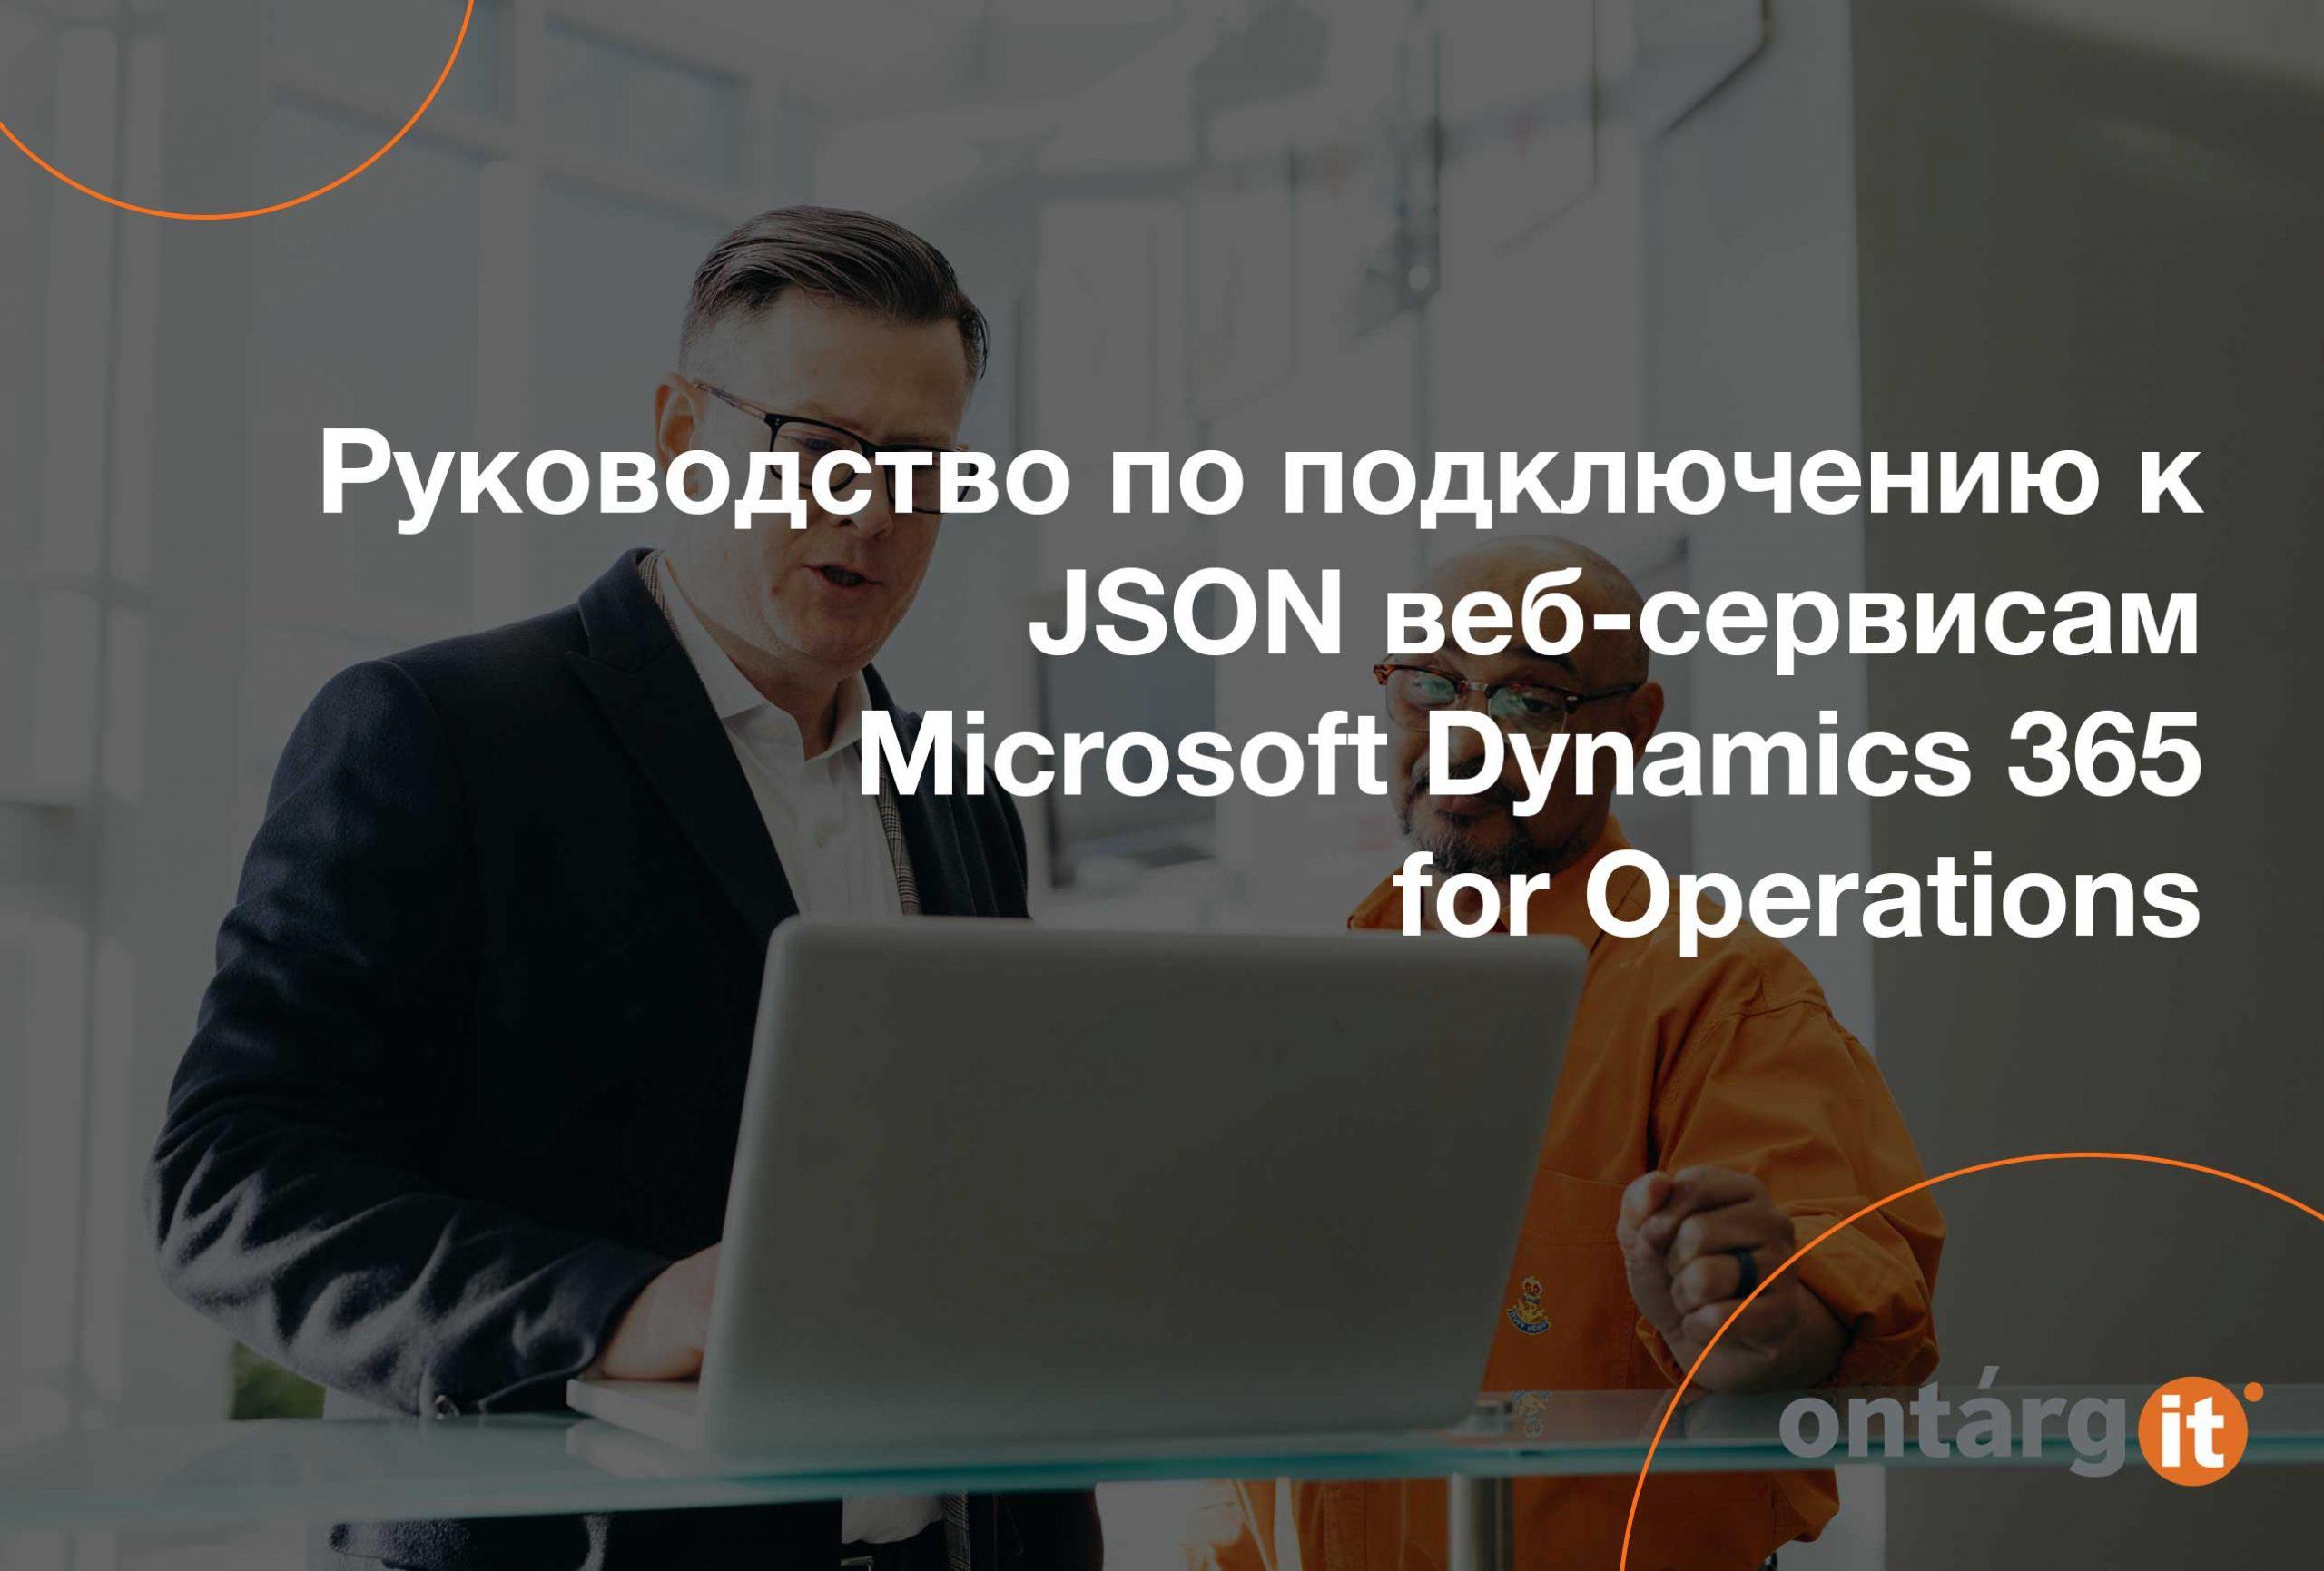 Руководство-по-подключению-к-JSON-веб-сервисам-Microsoft-Dynamics-365-for-Operations